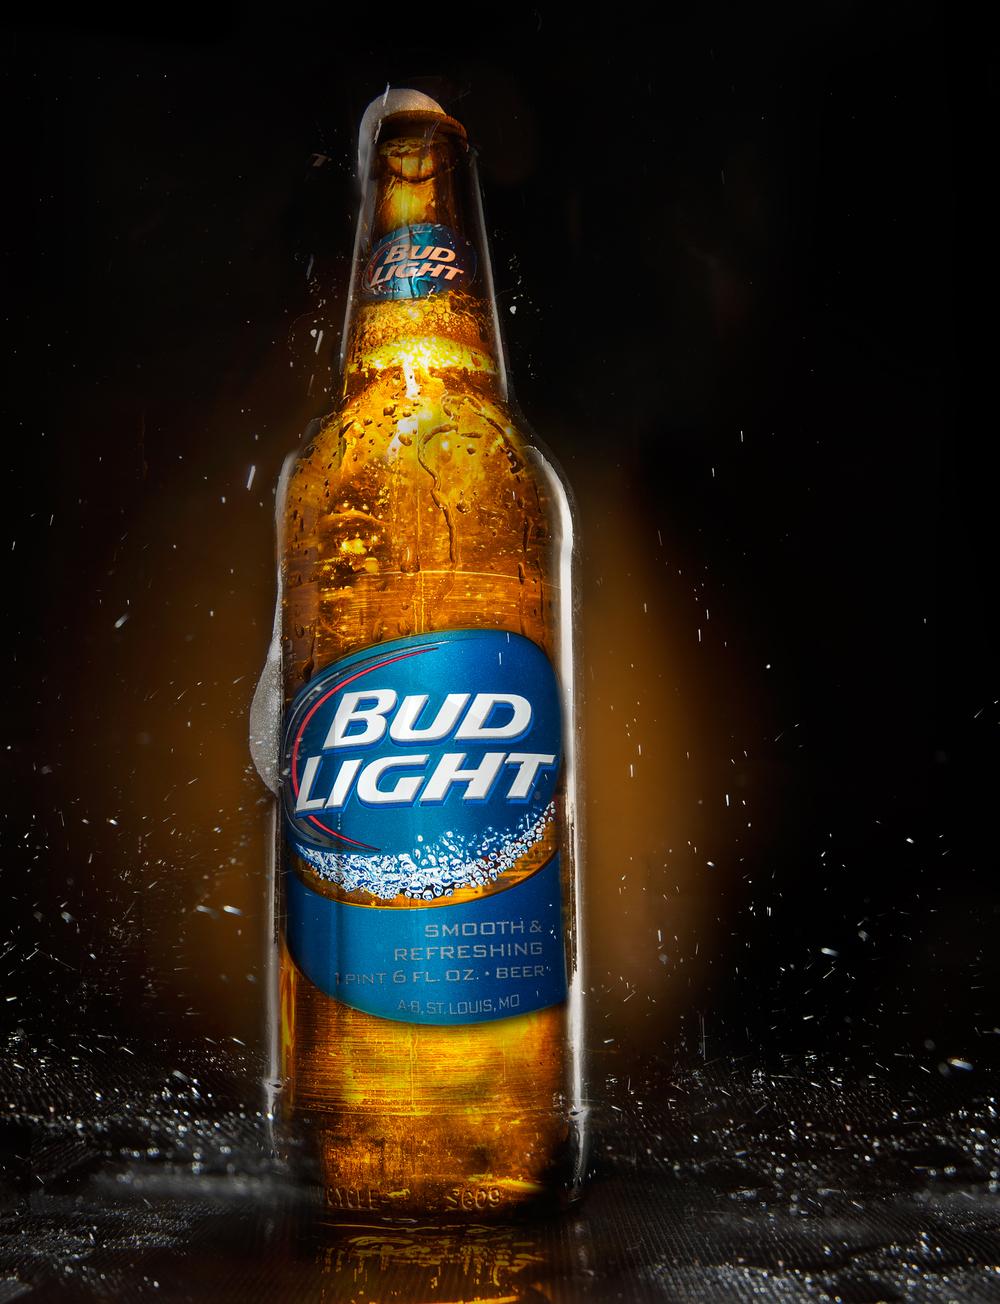 Budlight Bottle Advertisment commerical